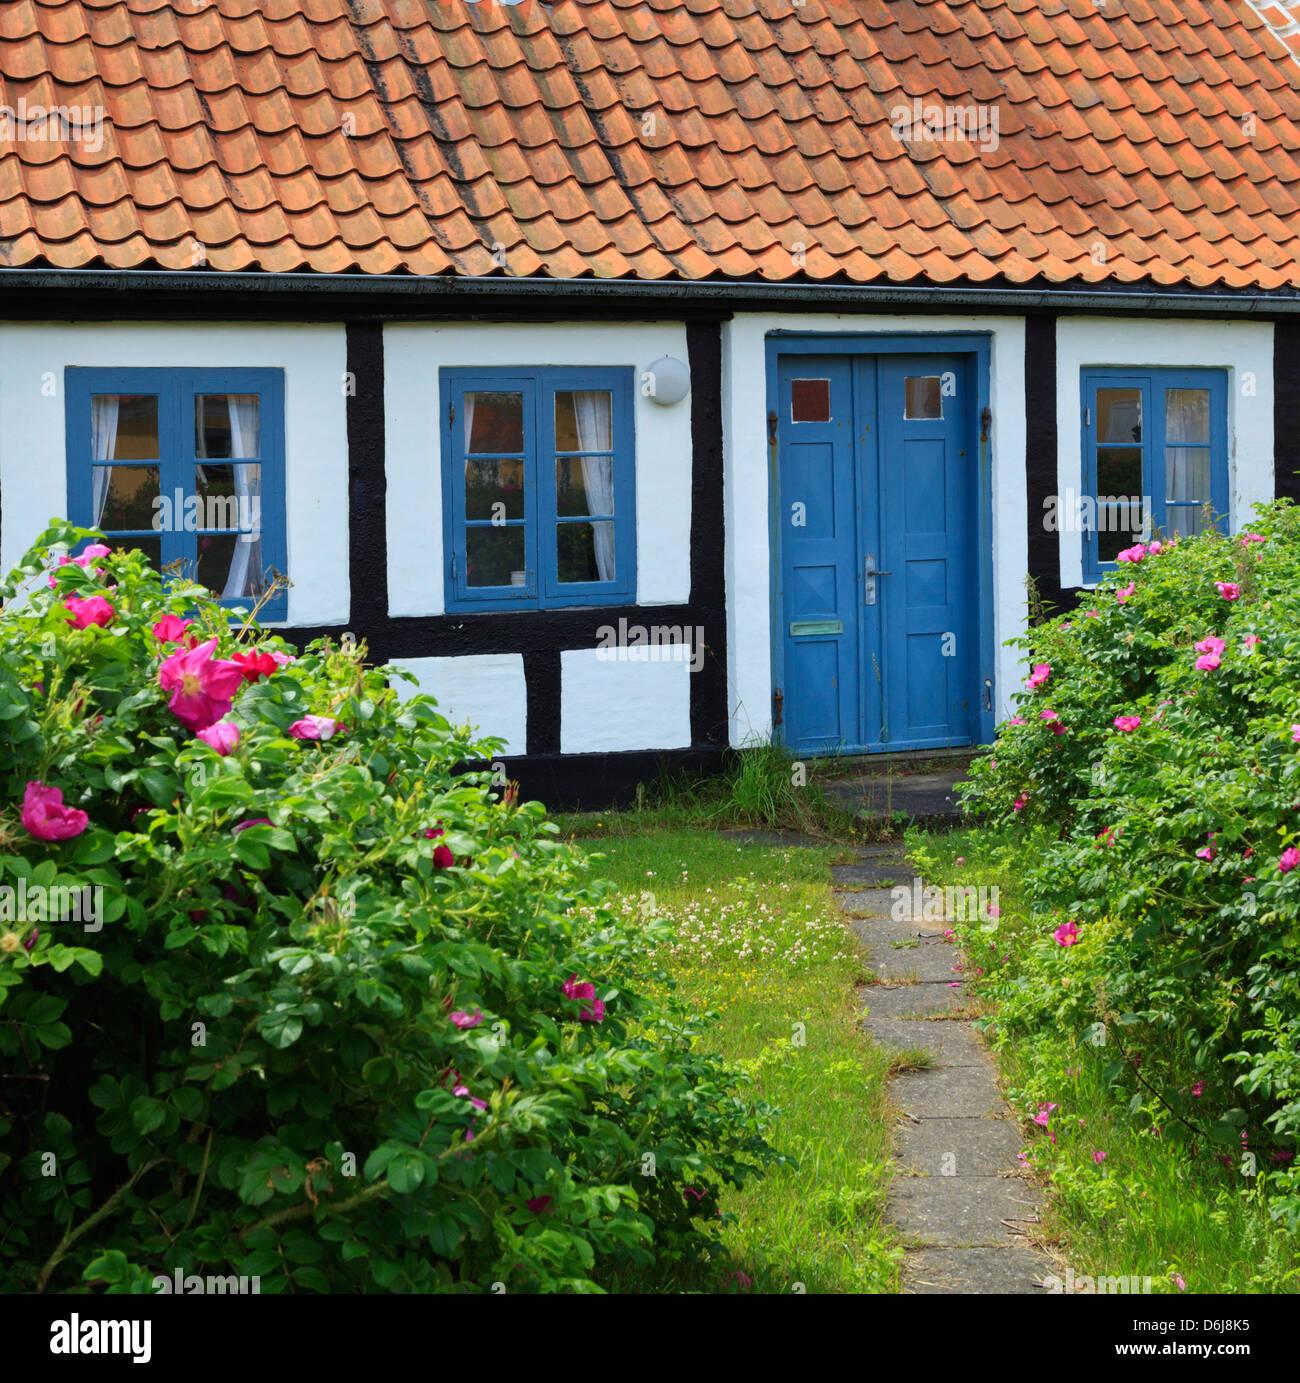 Maison à colombages traditionnelle, Gammel Skagen, Jutland, Danemark, Scandinavie, Europe Banque D'Images